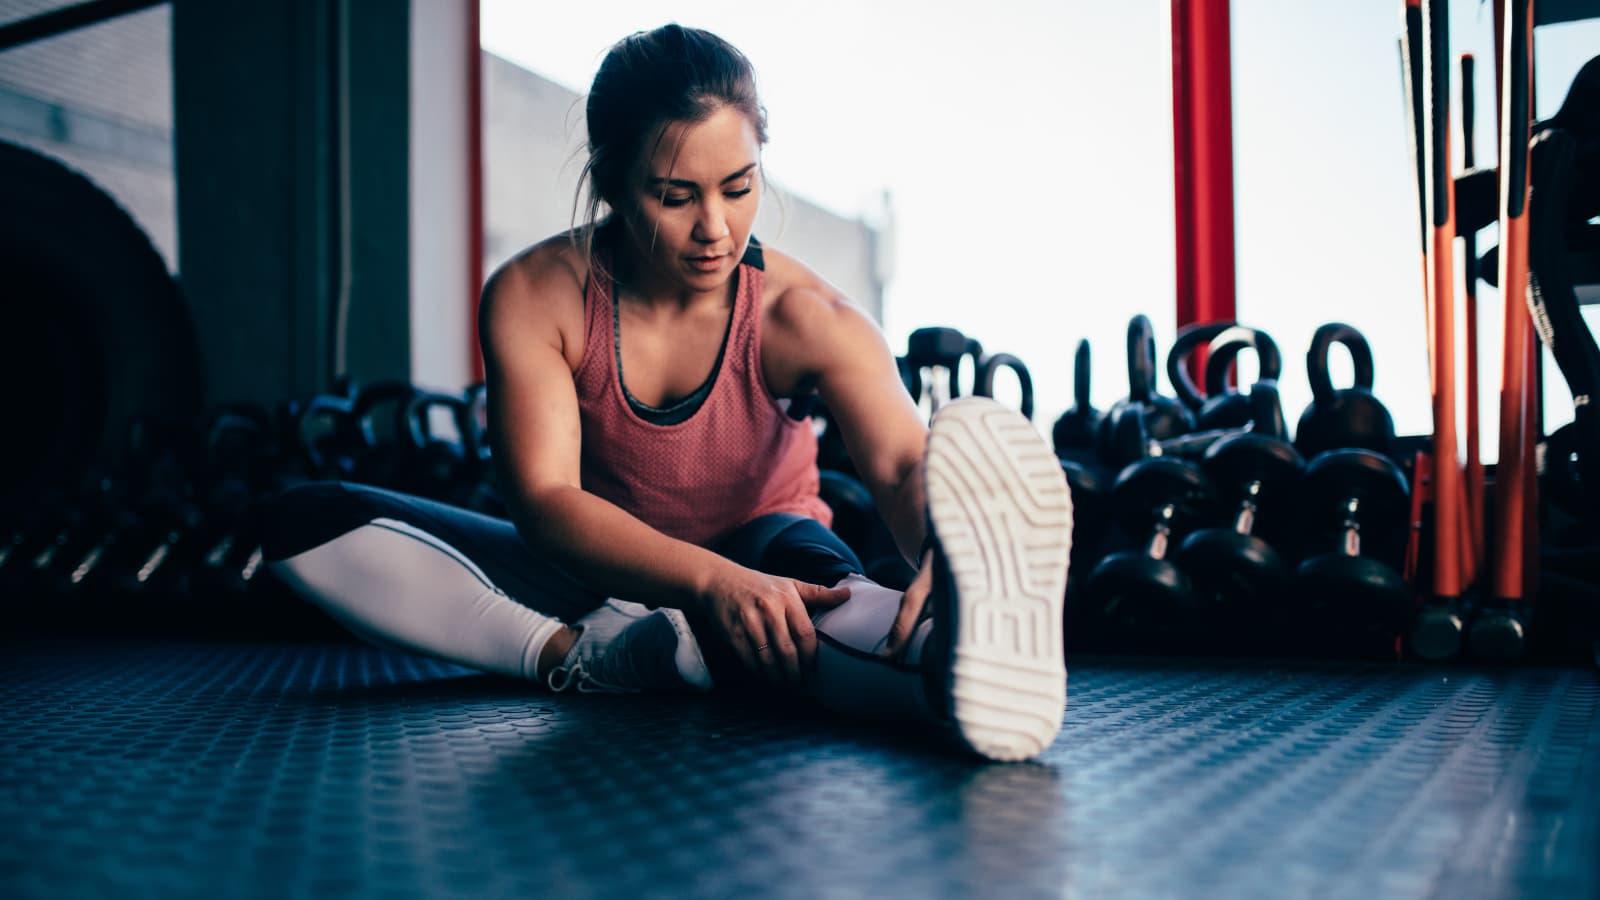 Many don't plan to renew their gym memberships post-pandemic: survey